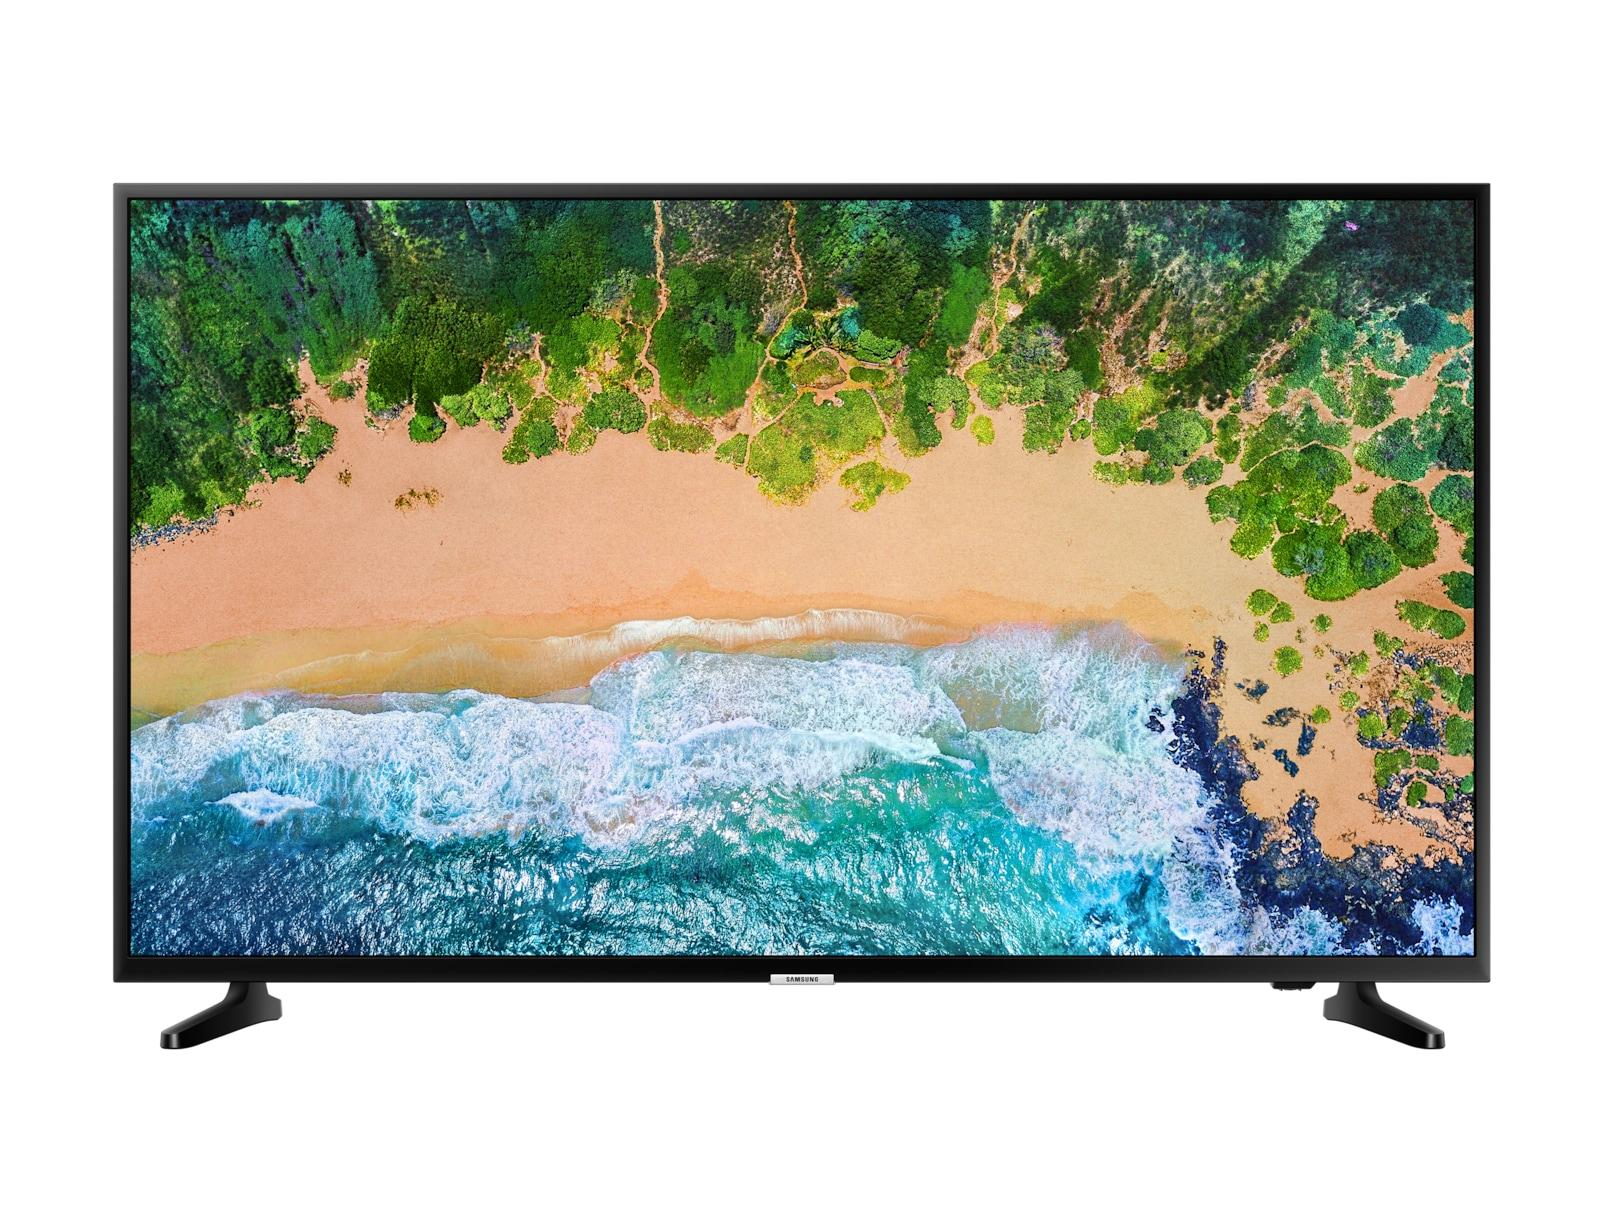 UE50NU7092 - Téléviseur LED 4K